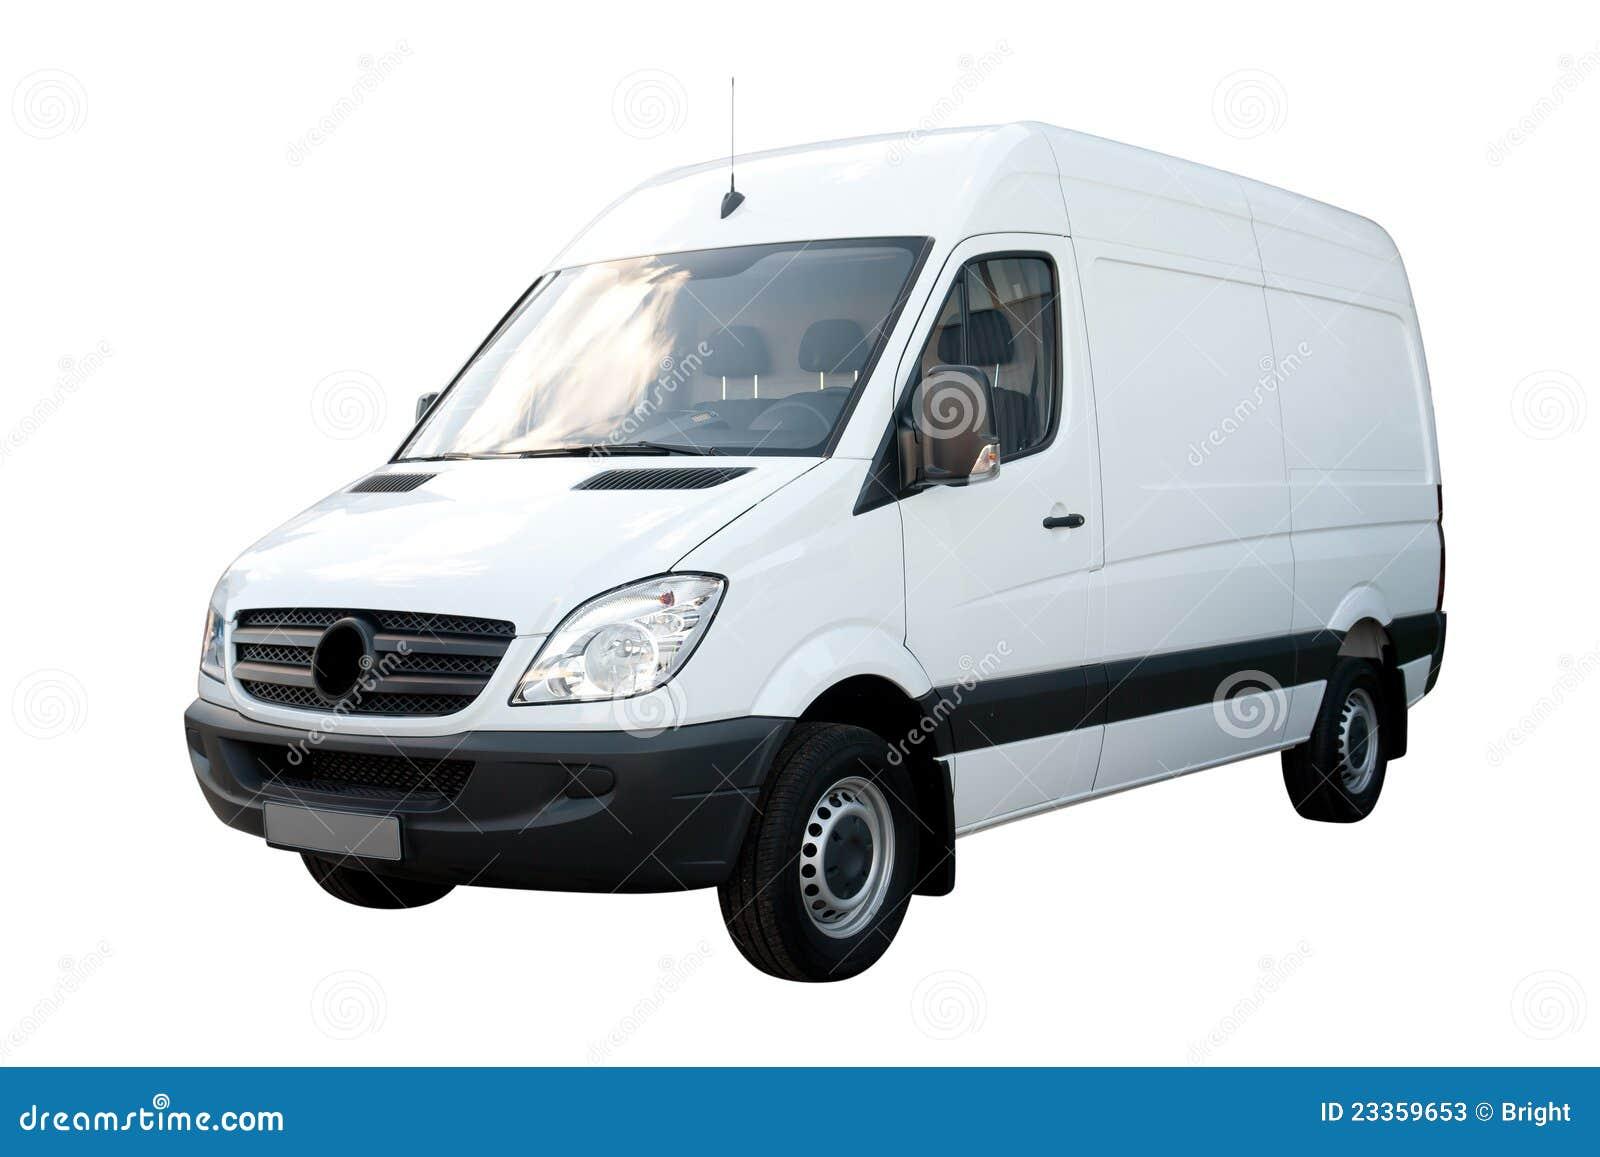 white cargo van stock photos image 23359653. Black Bedroom Furniture Sets. Home Design Ideas